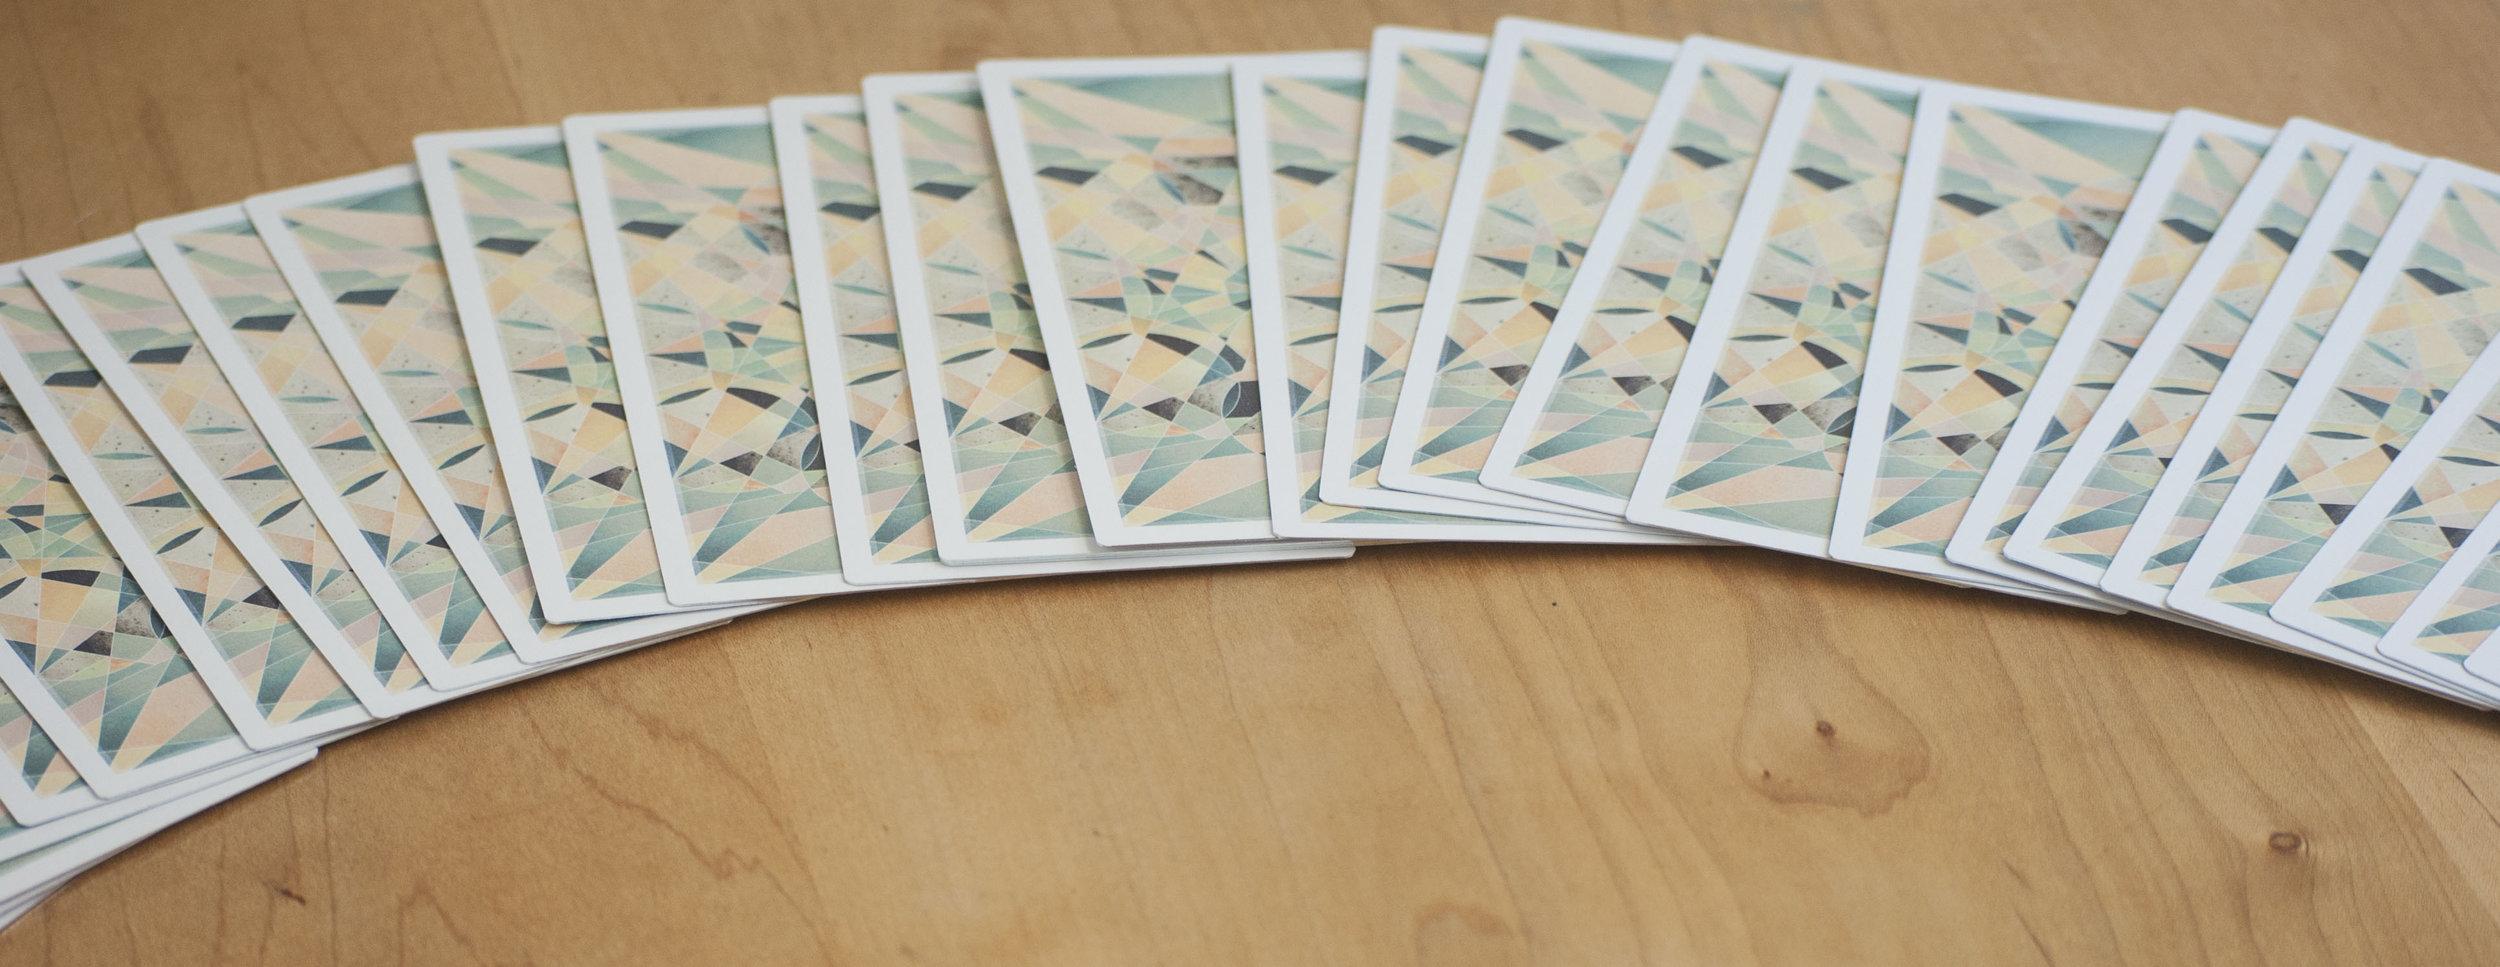 How to Shuffle Tarot Cards Fountain Tarot